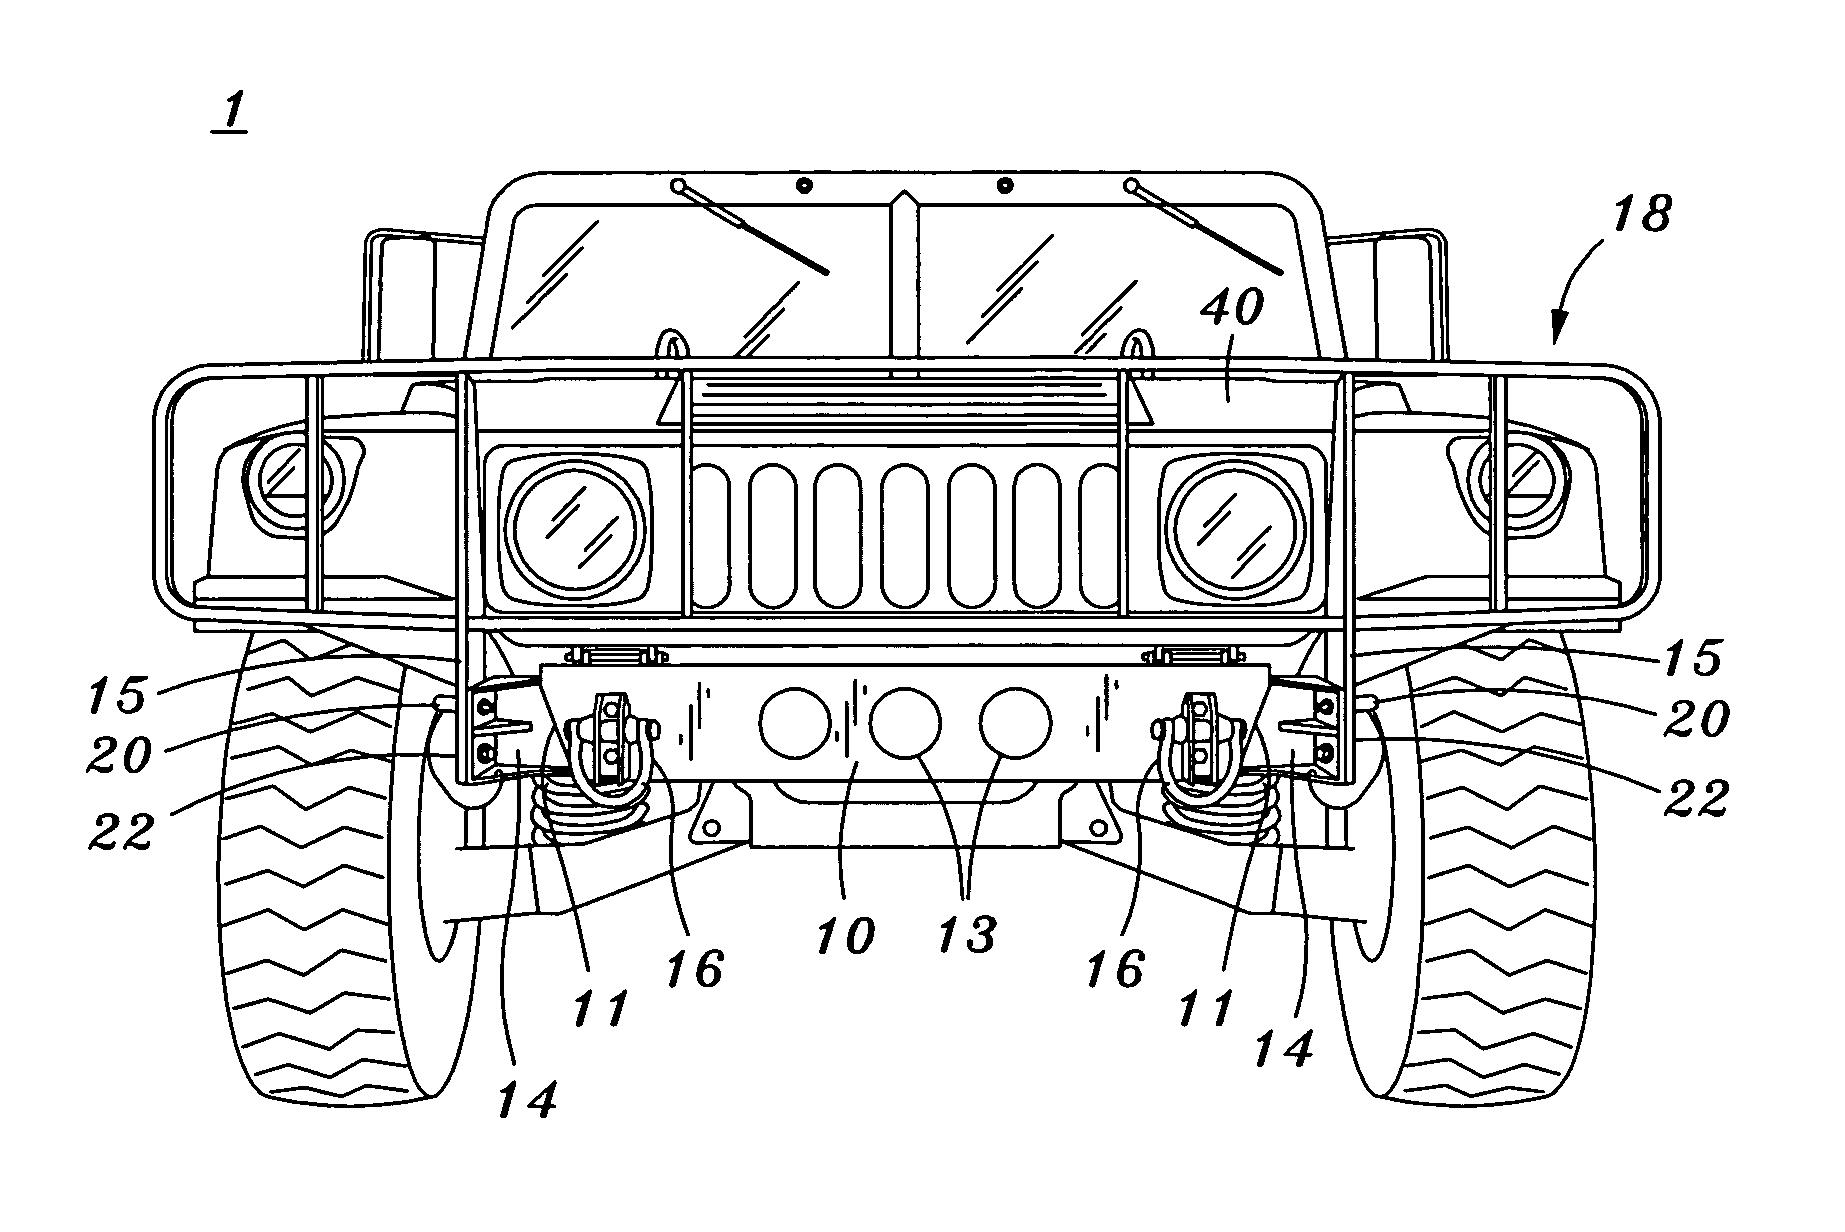 H2 Hummer Sketch Templates